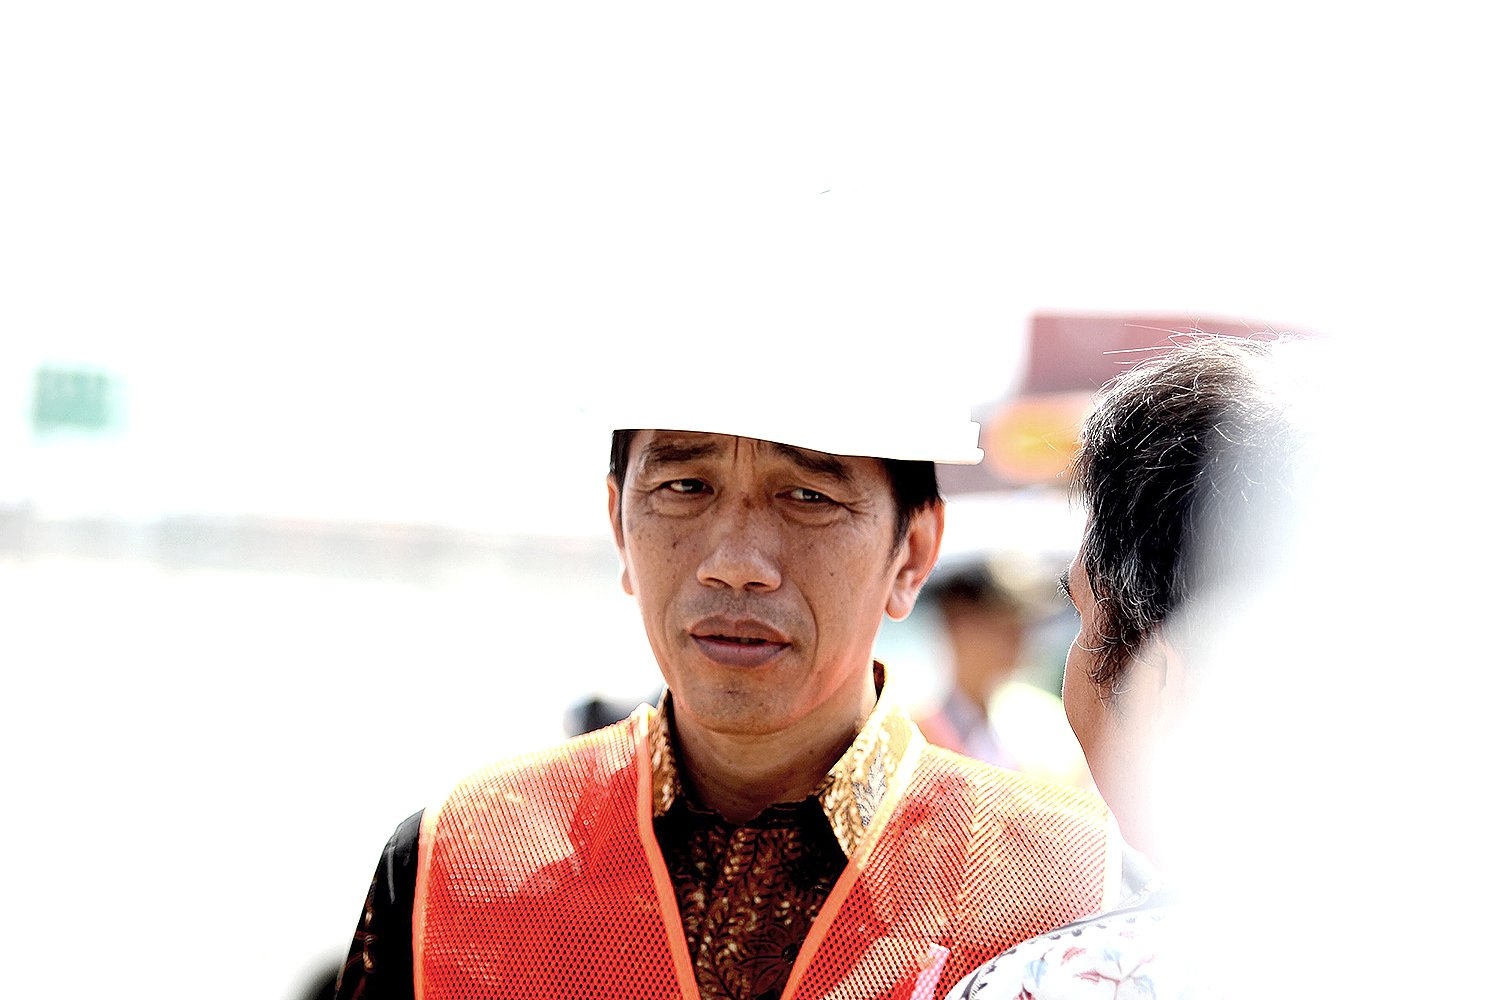 Presiden Joko Widodo meminta Pelindo II segera merampungkan pembangunan Terminal Petikemas Kalibaru.